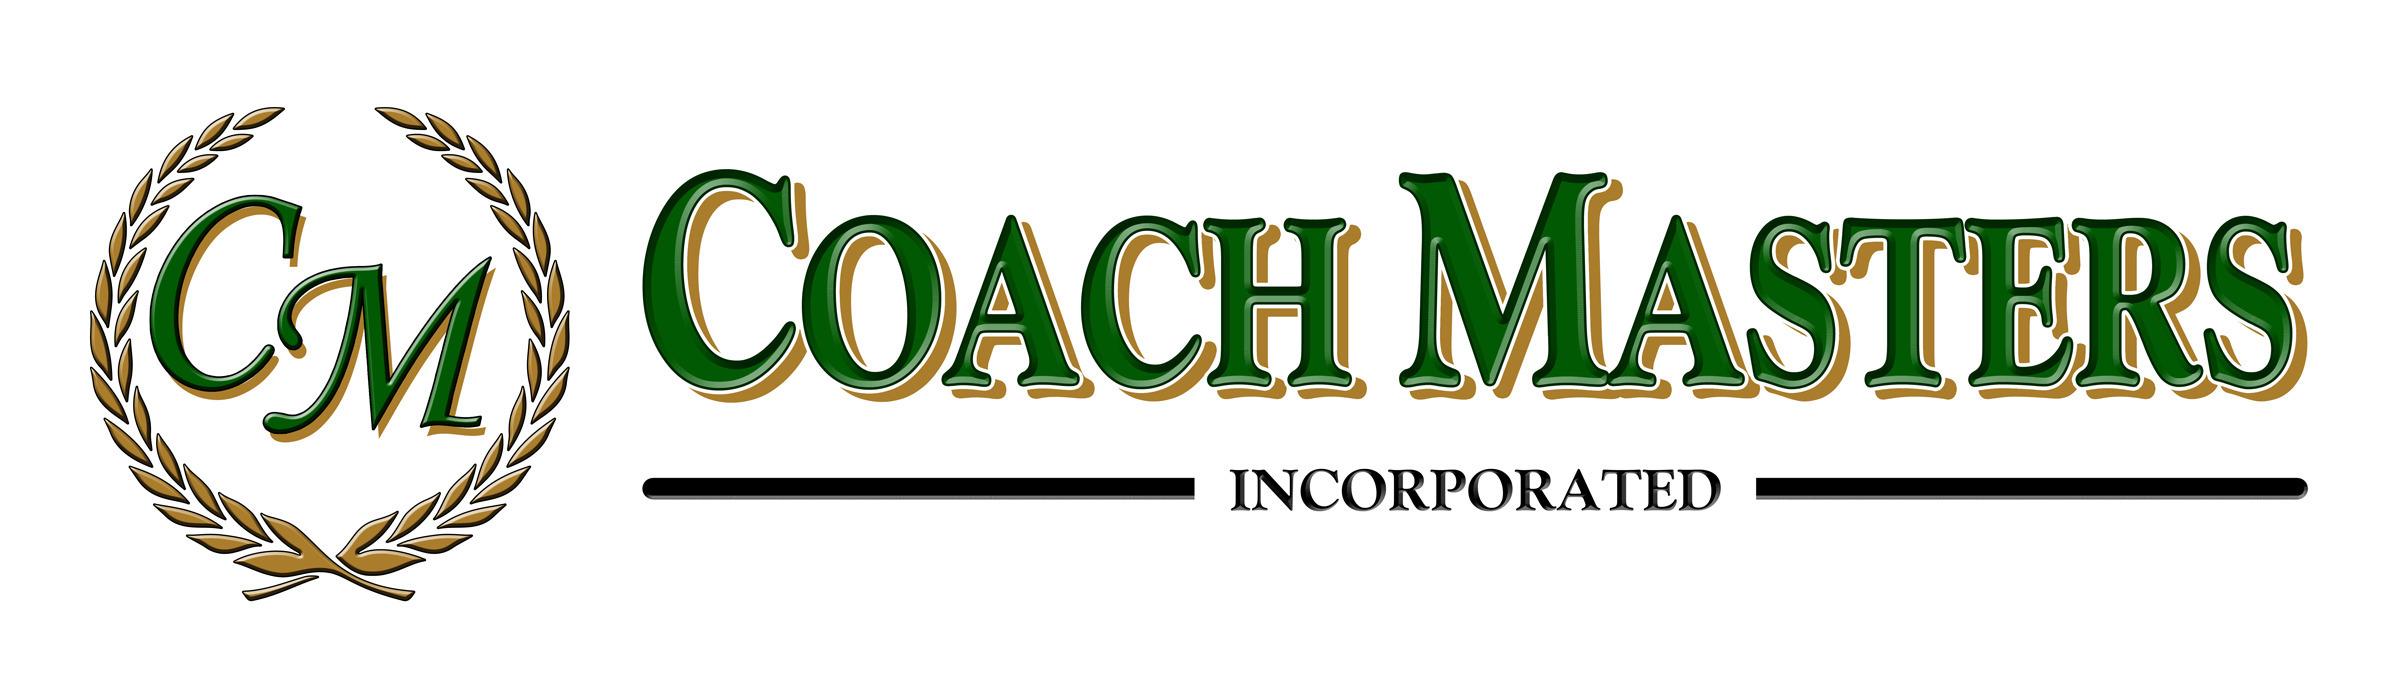 Coach Masters Inc.